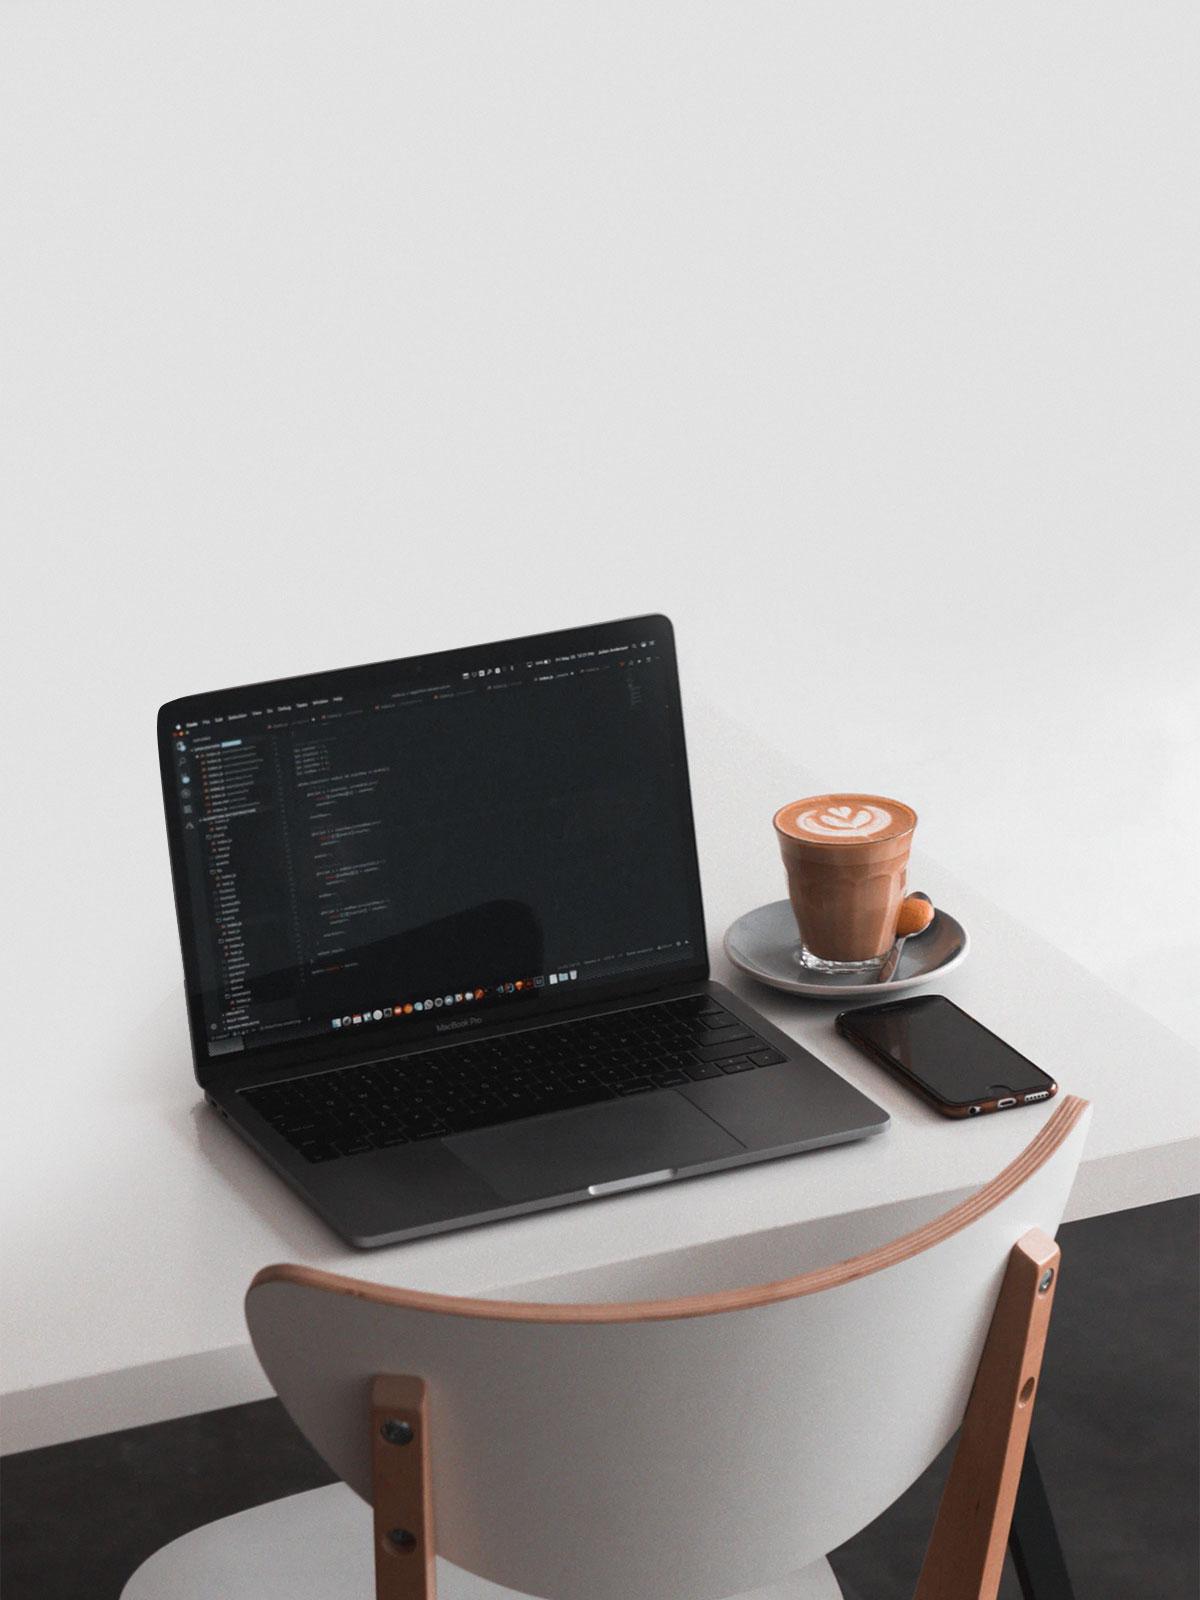 Best Blog Host Site